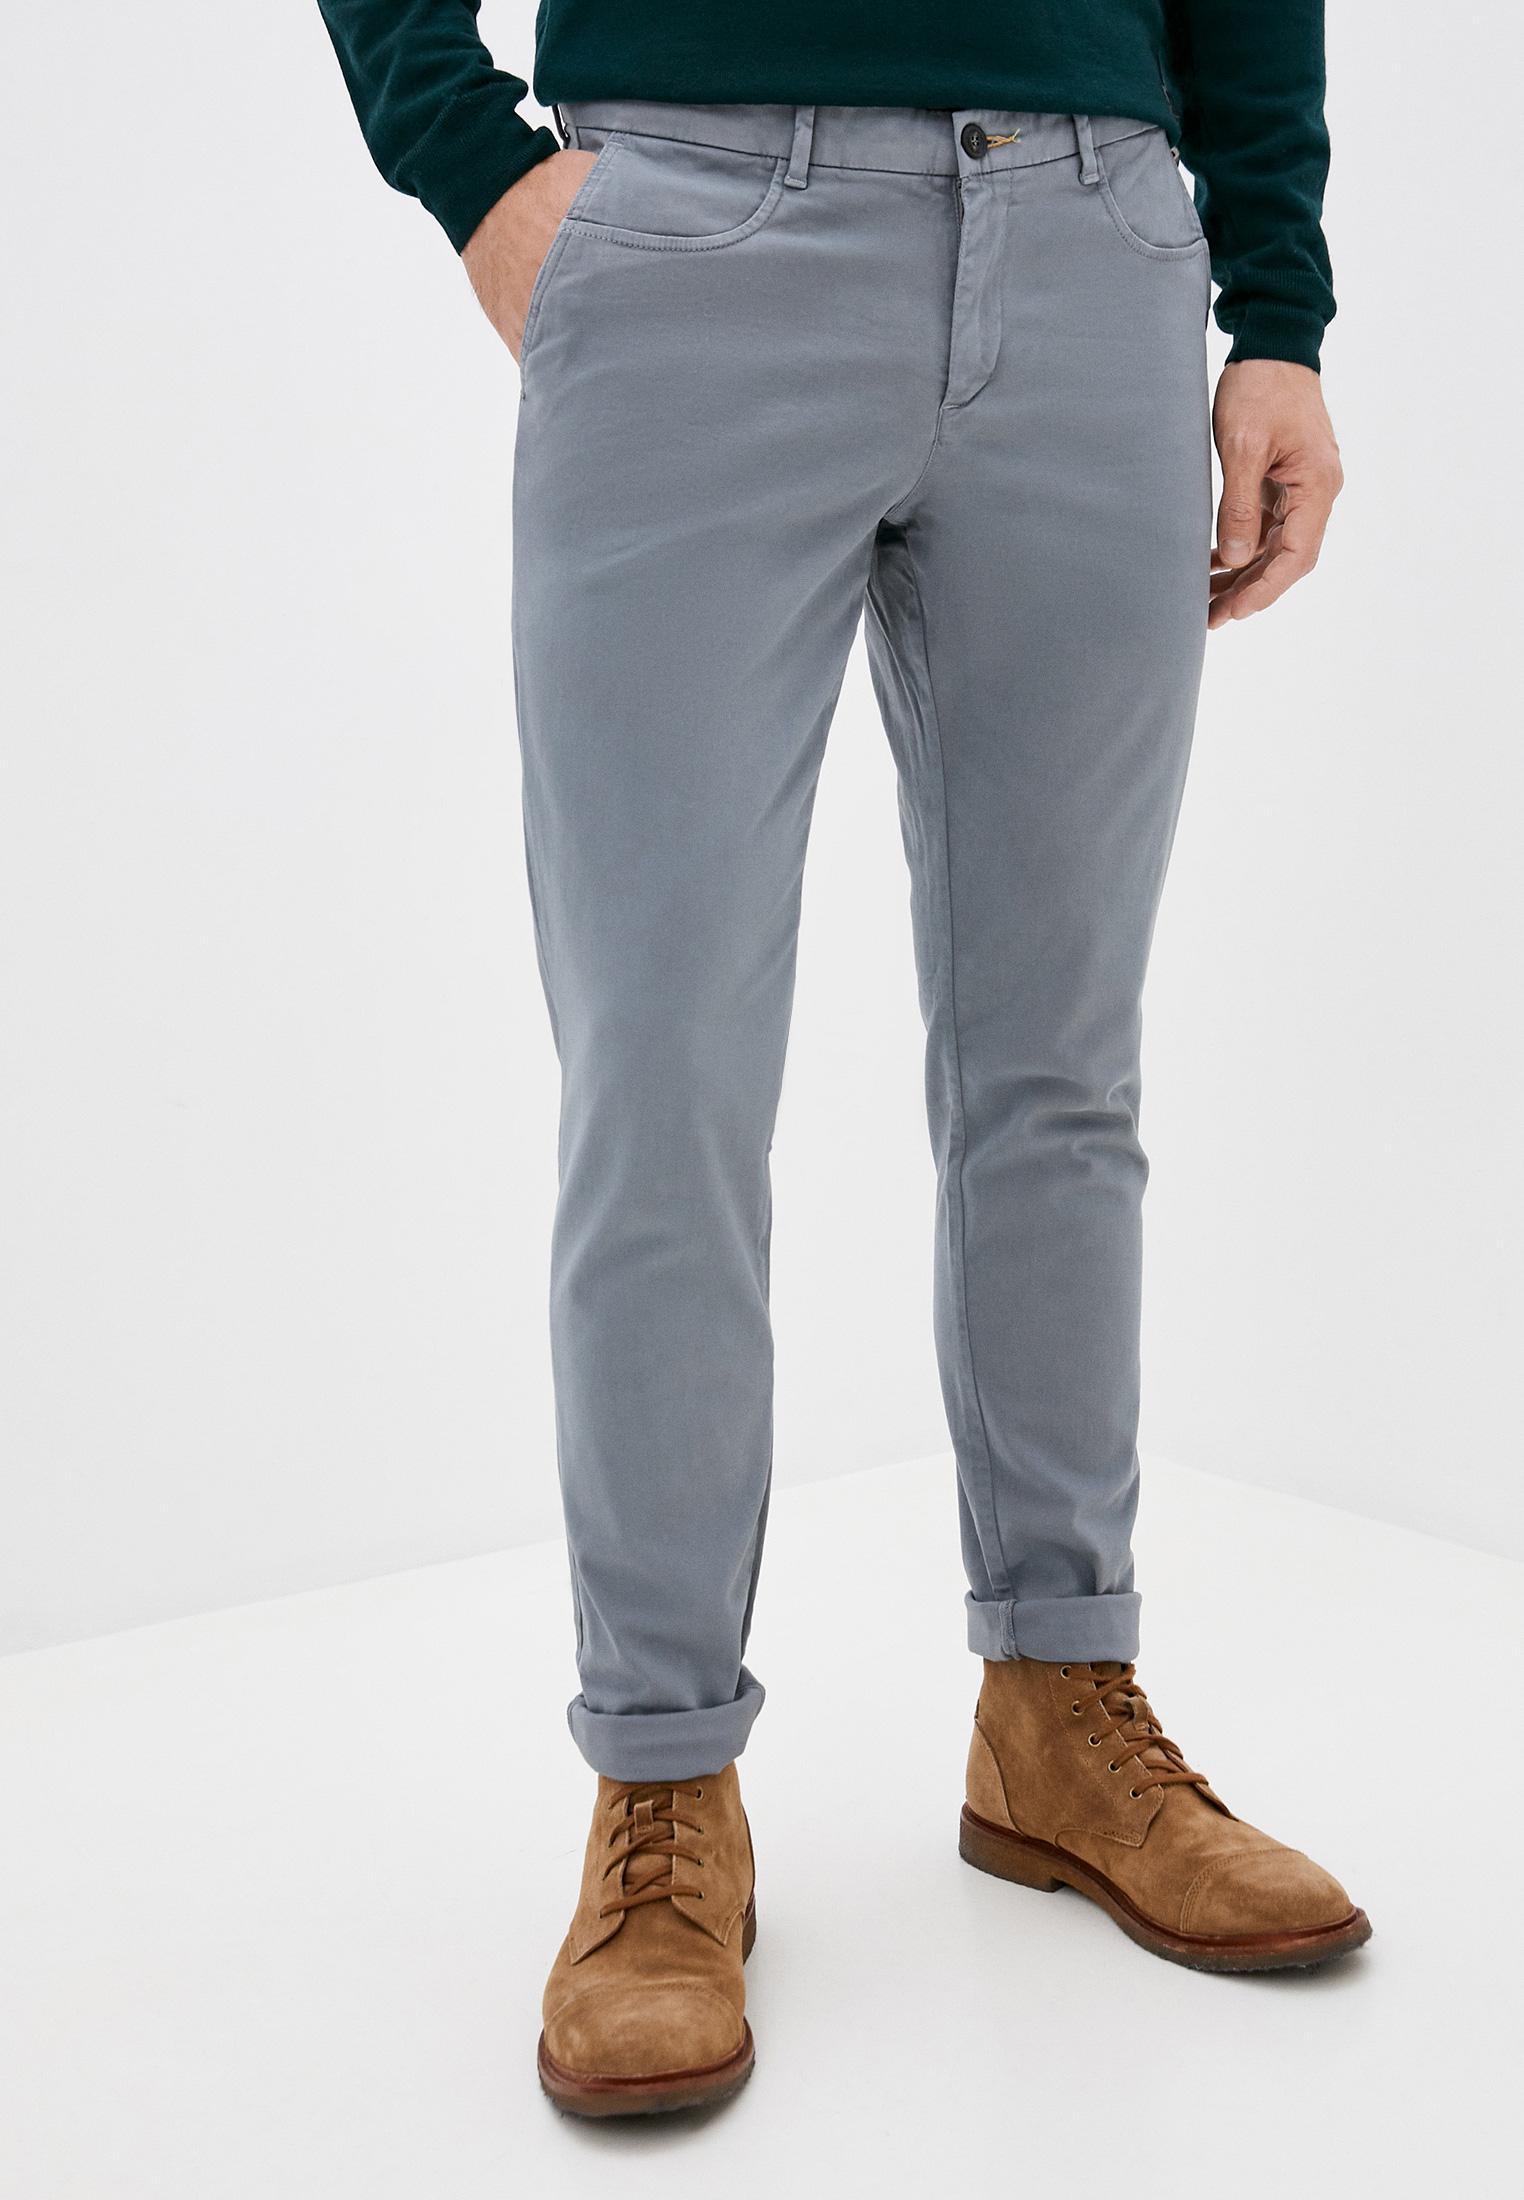 Мужские брюки Trussardi 52P00000-1T001702-H-001